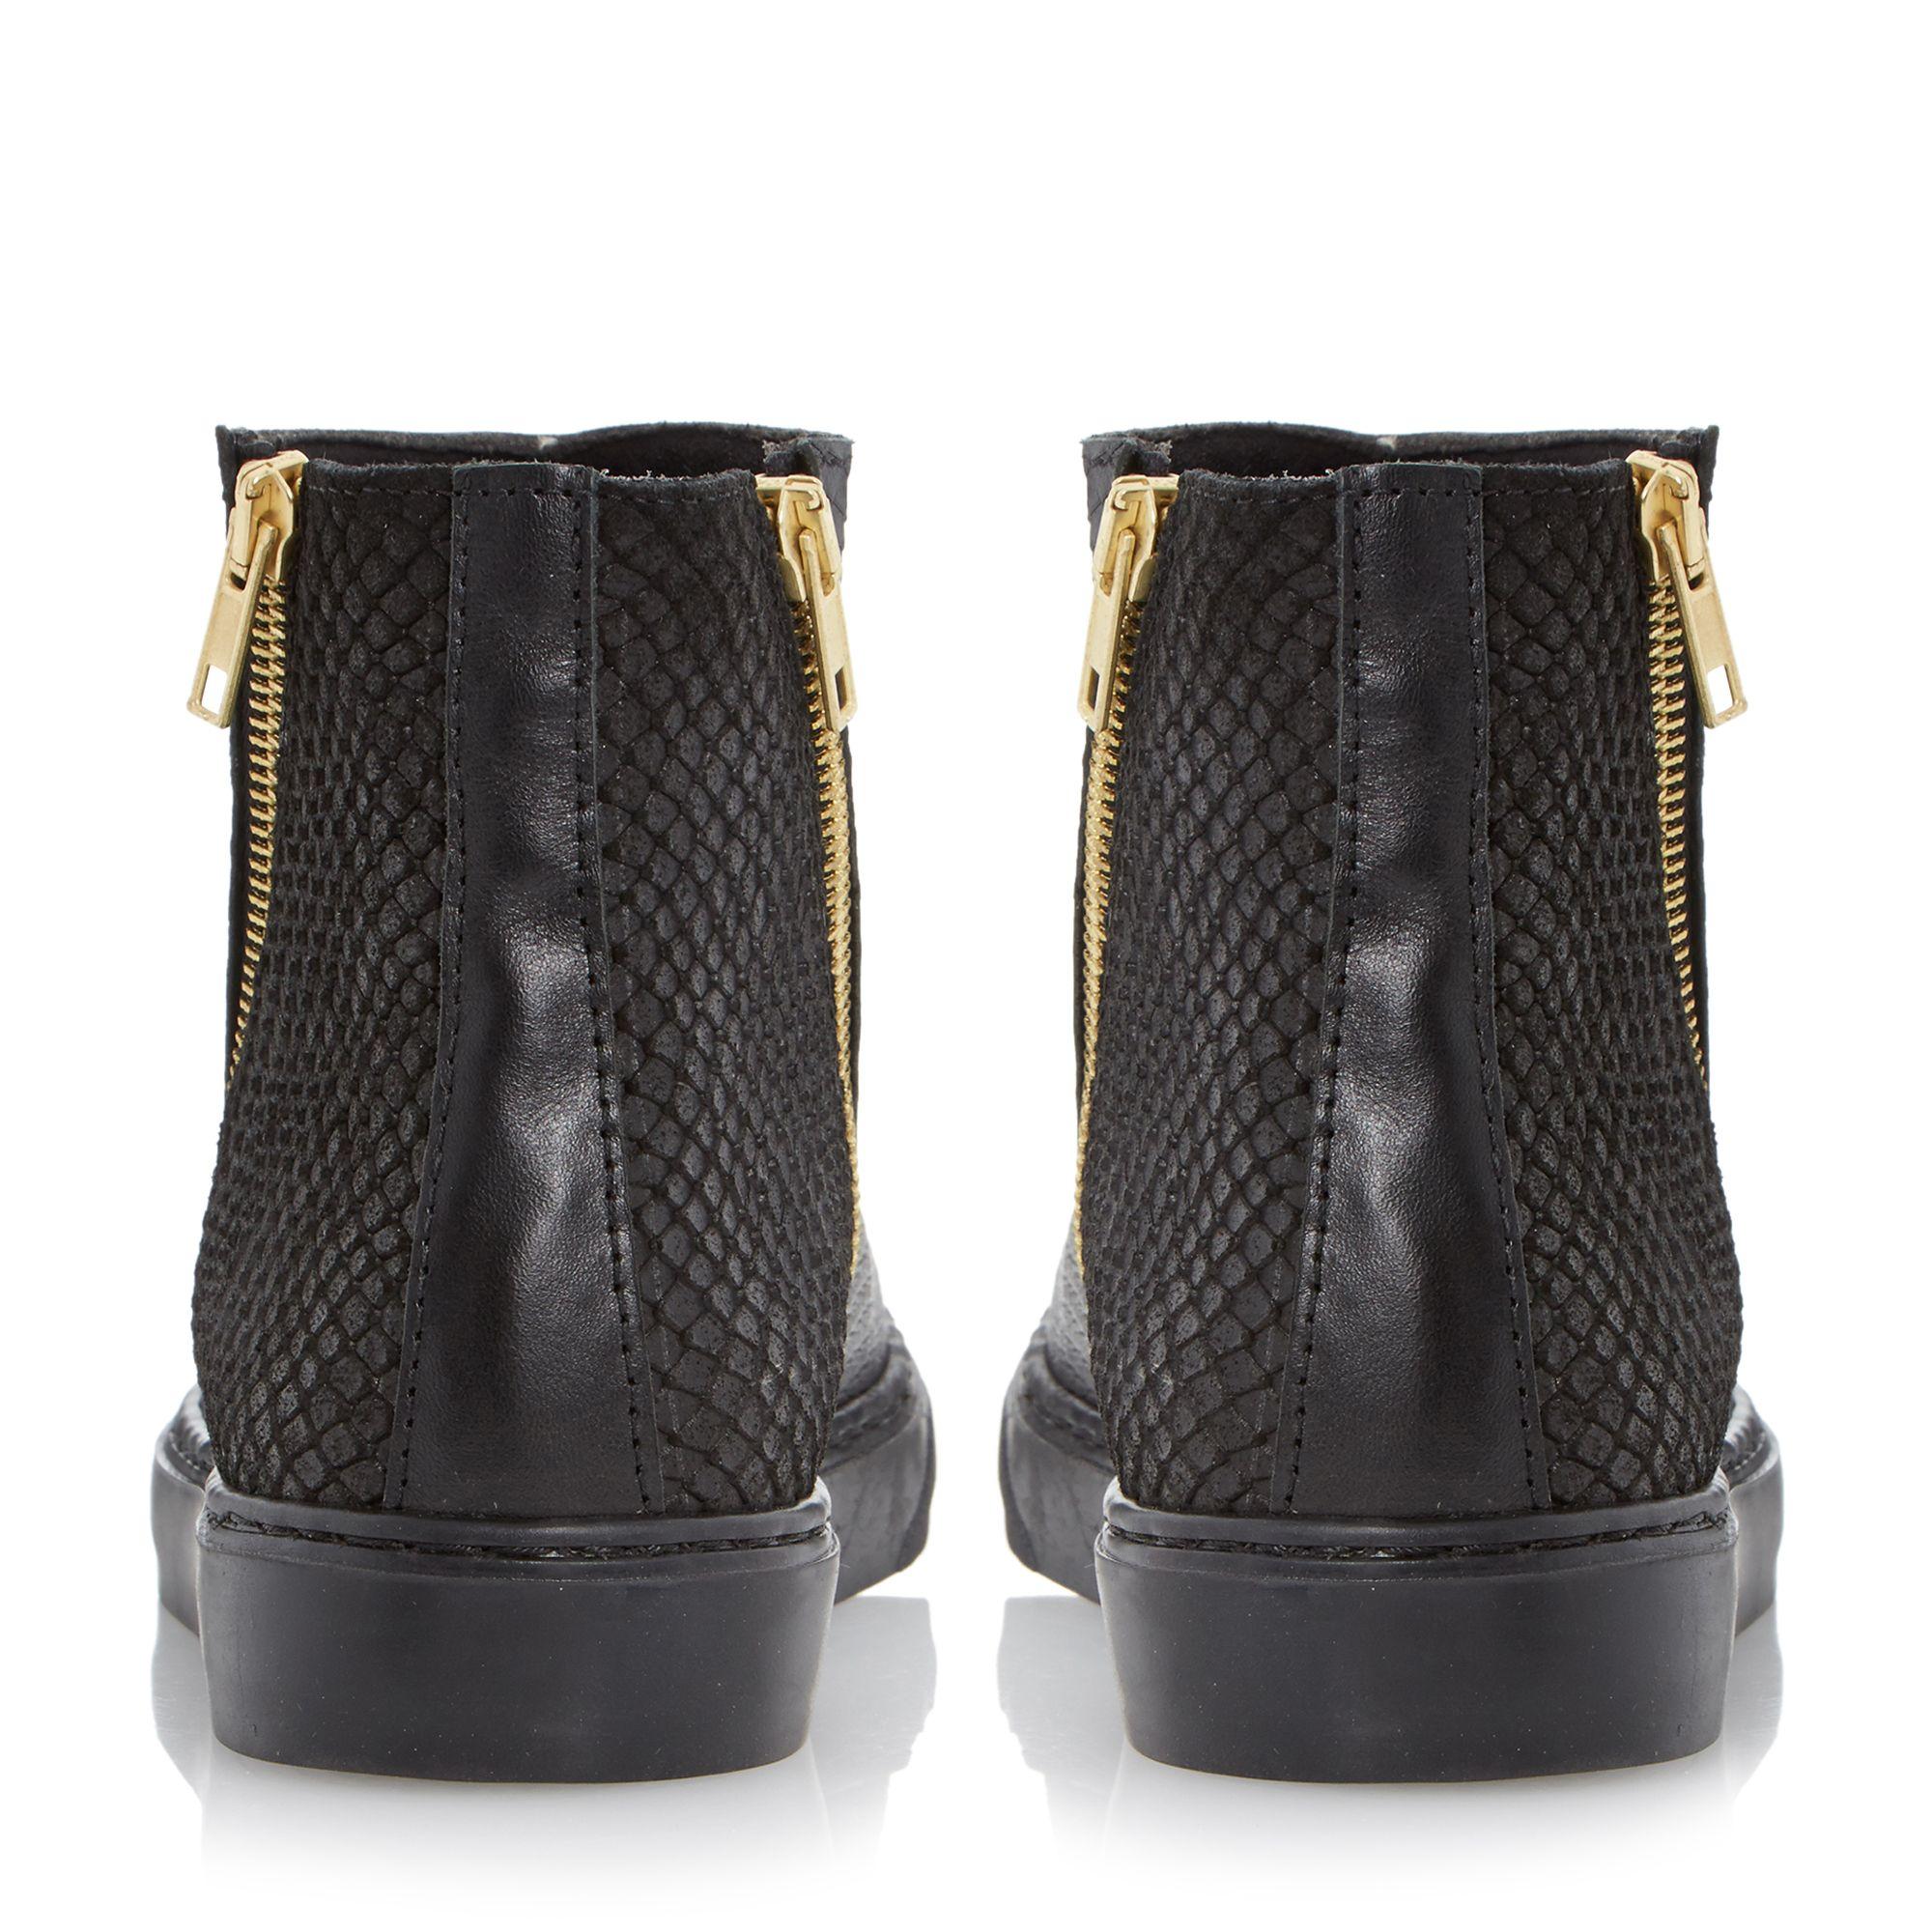 Dune Paddo Leather Side Zip Hi Top Trainer in Black